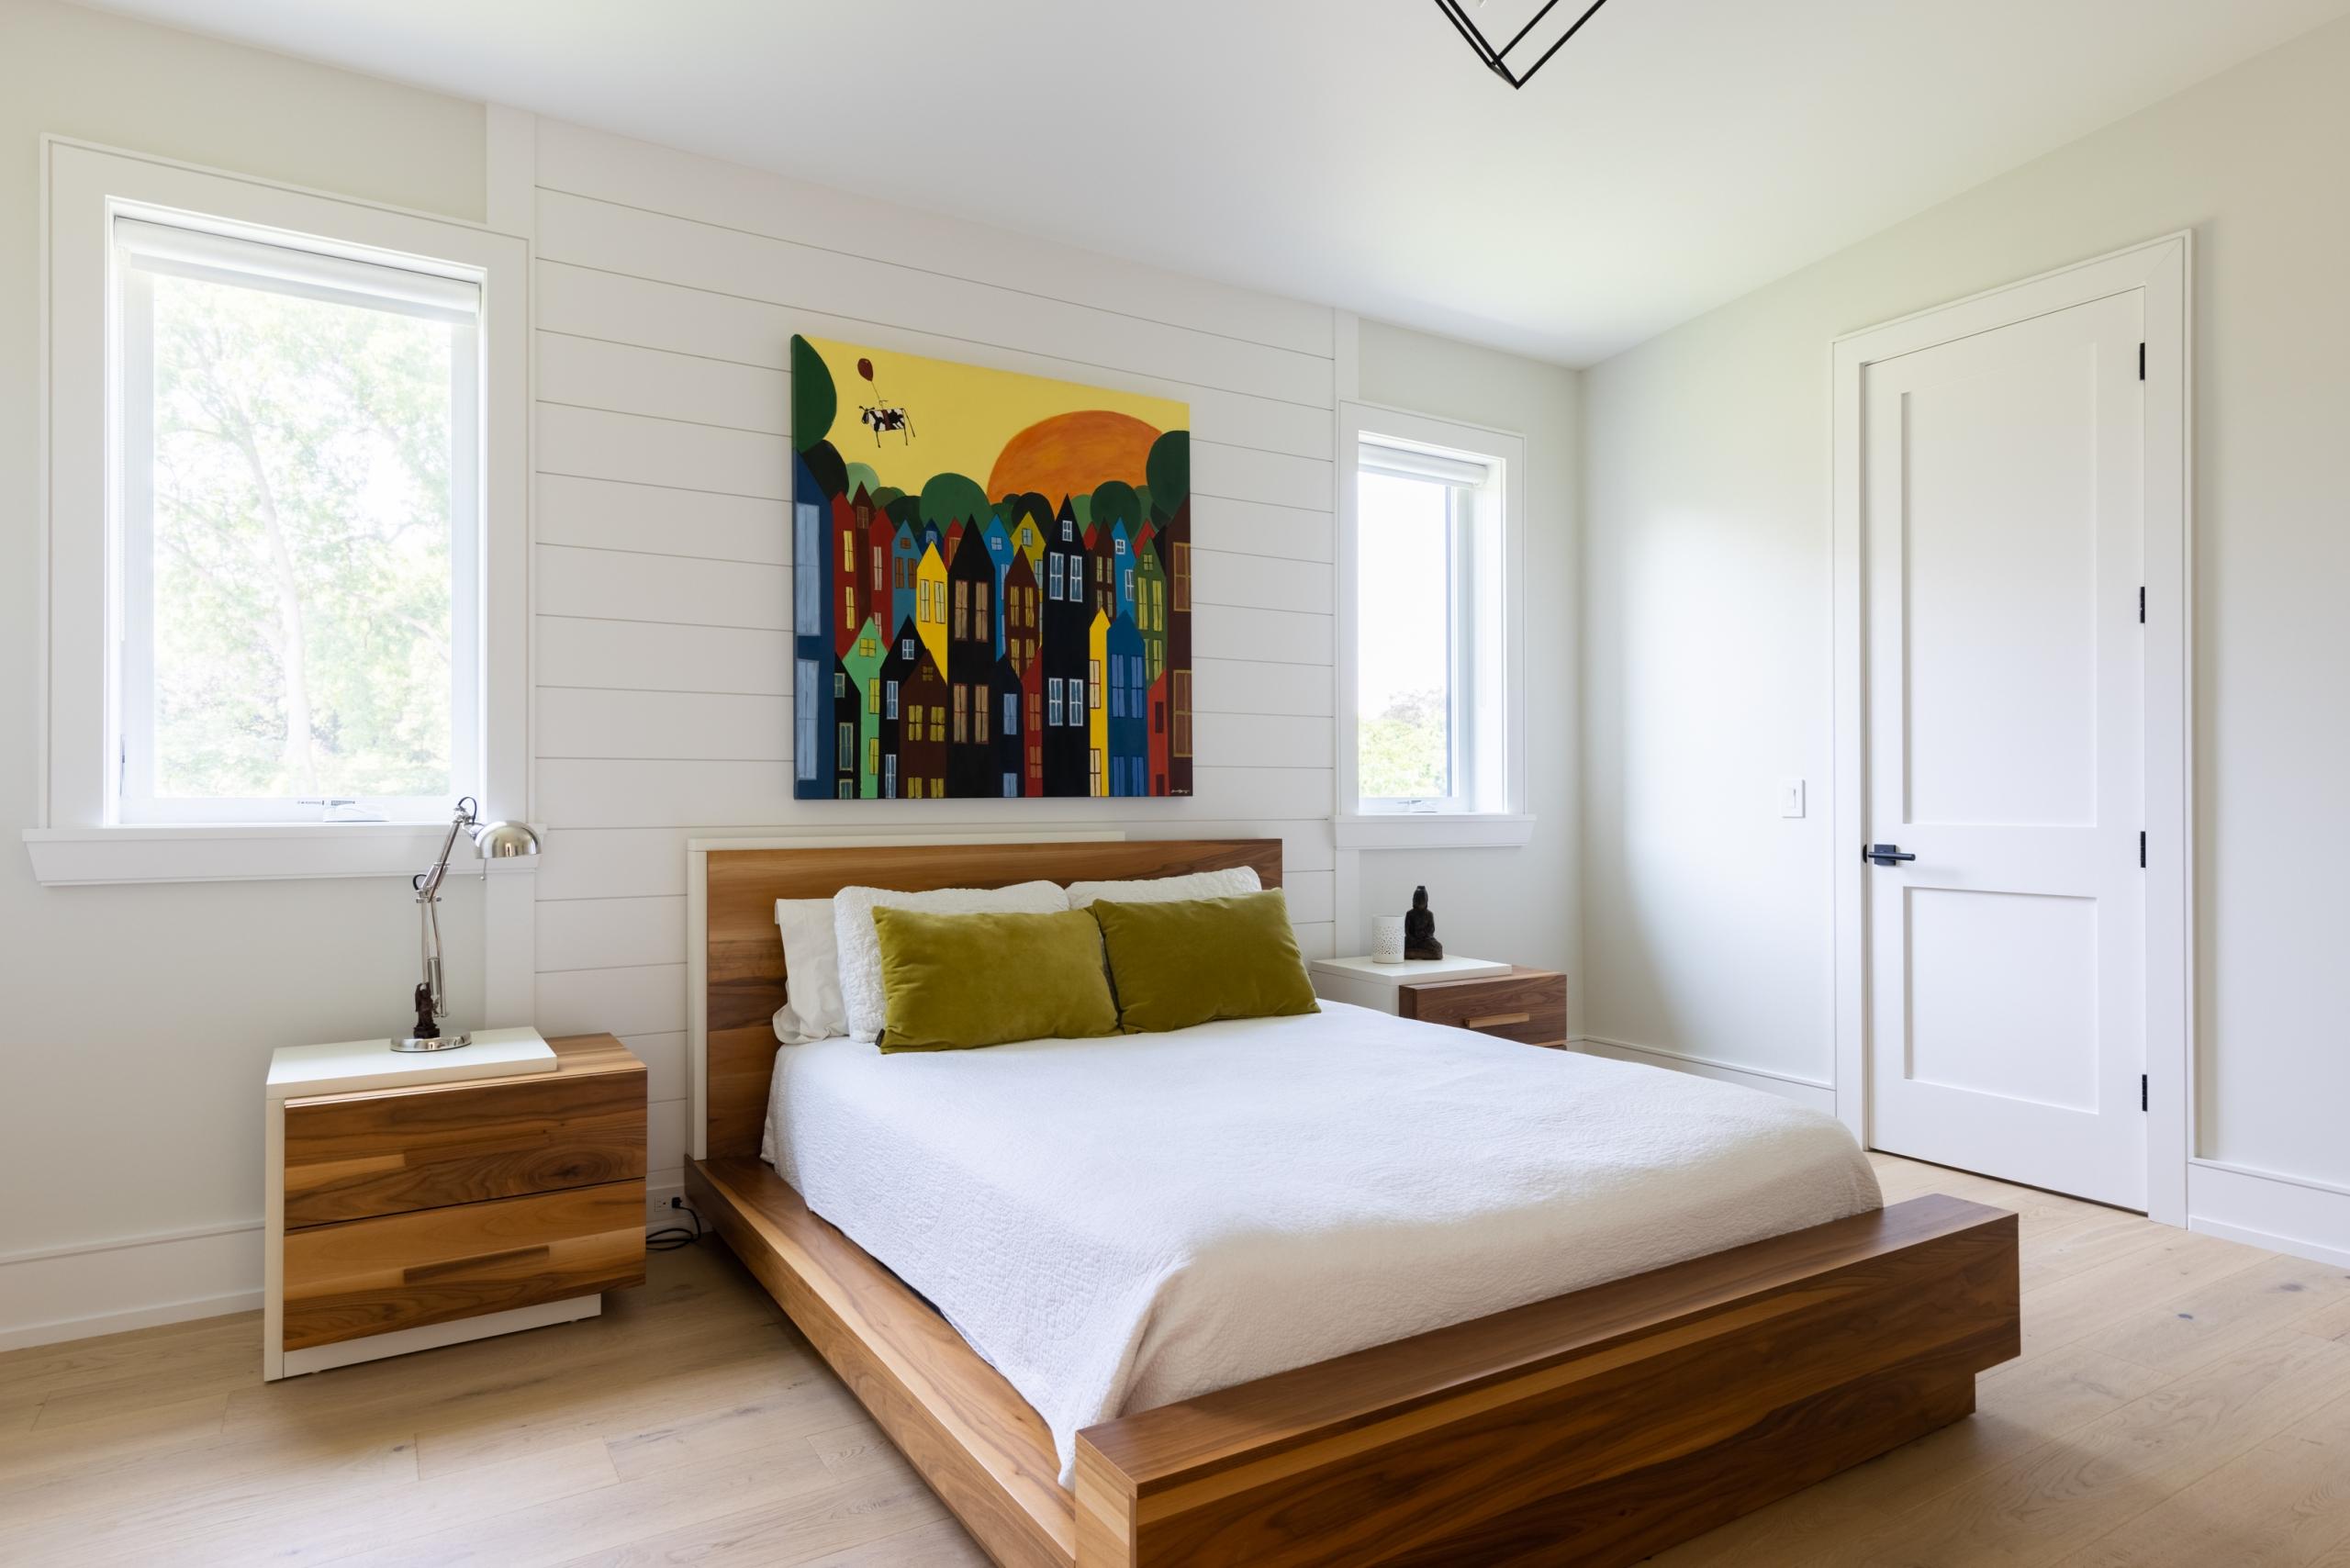 Bedroom featured at 489 Lakeshore Road W, Oakville at Alex Irish & Associates